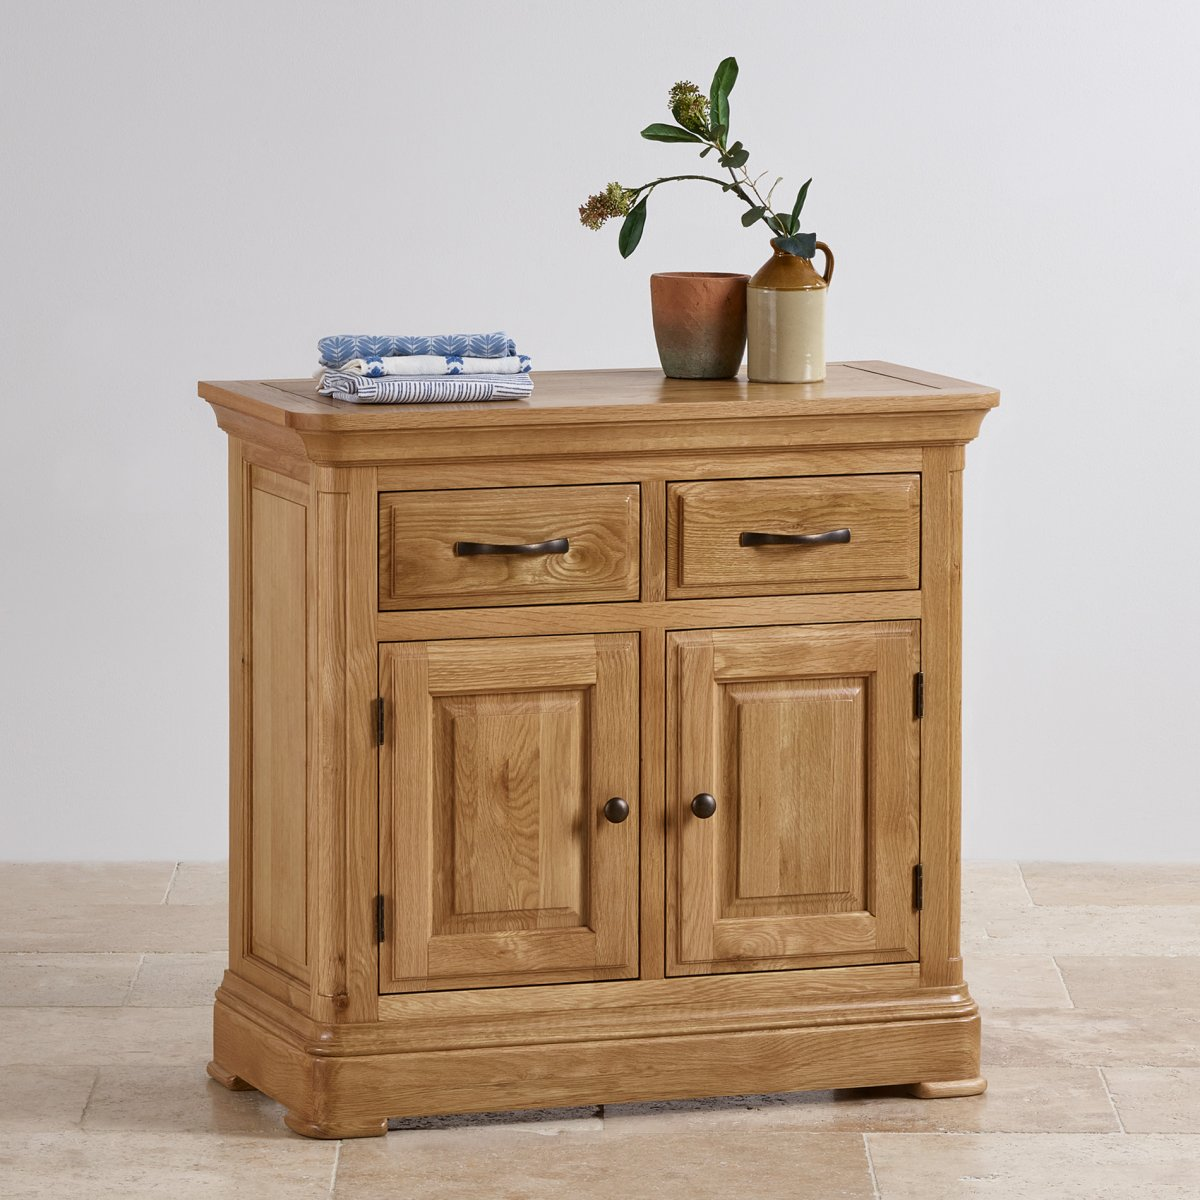 canterbury small sideboard solid oak oak furniture land. Black Bedroom Furniture Sets. Home Design Ideas